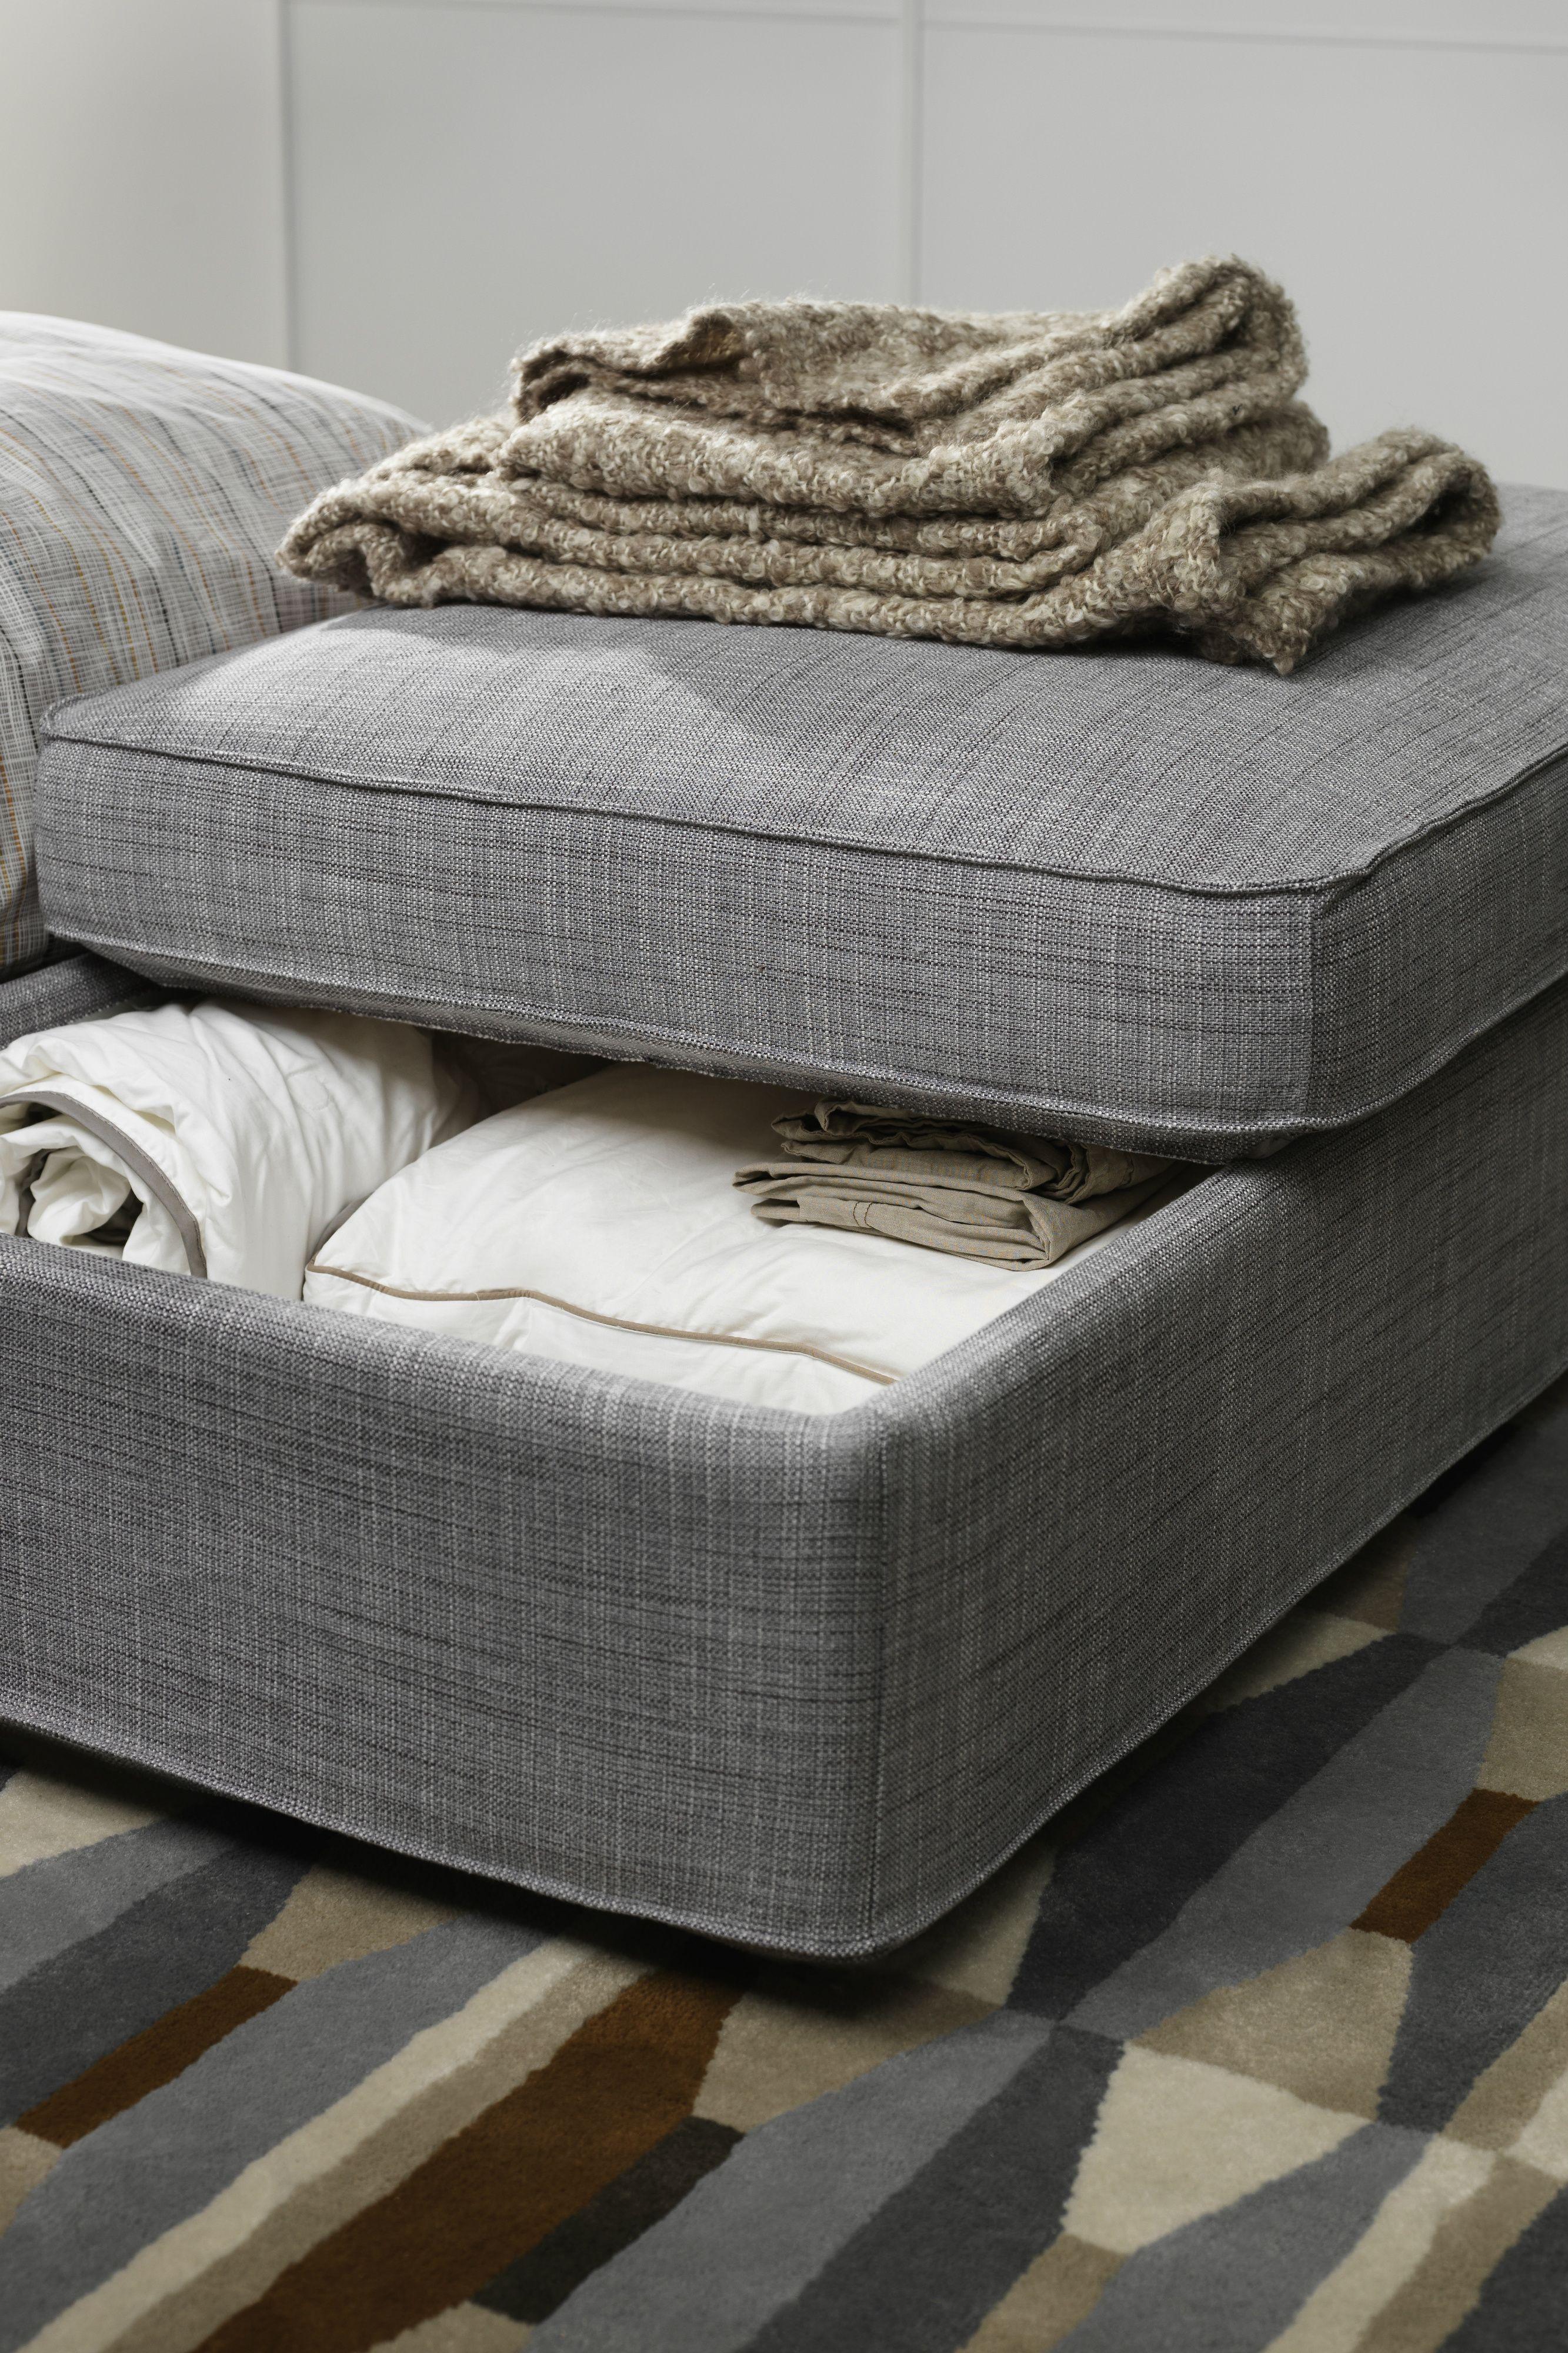 Storage Is Even Better When It S Hidden The Ikea Kivik Footstool